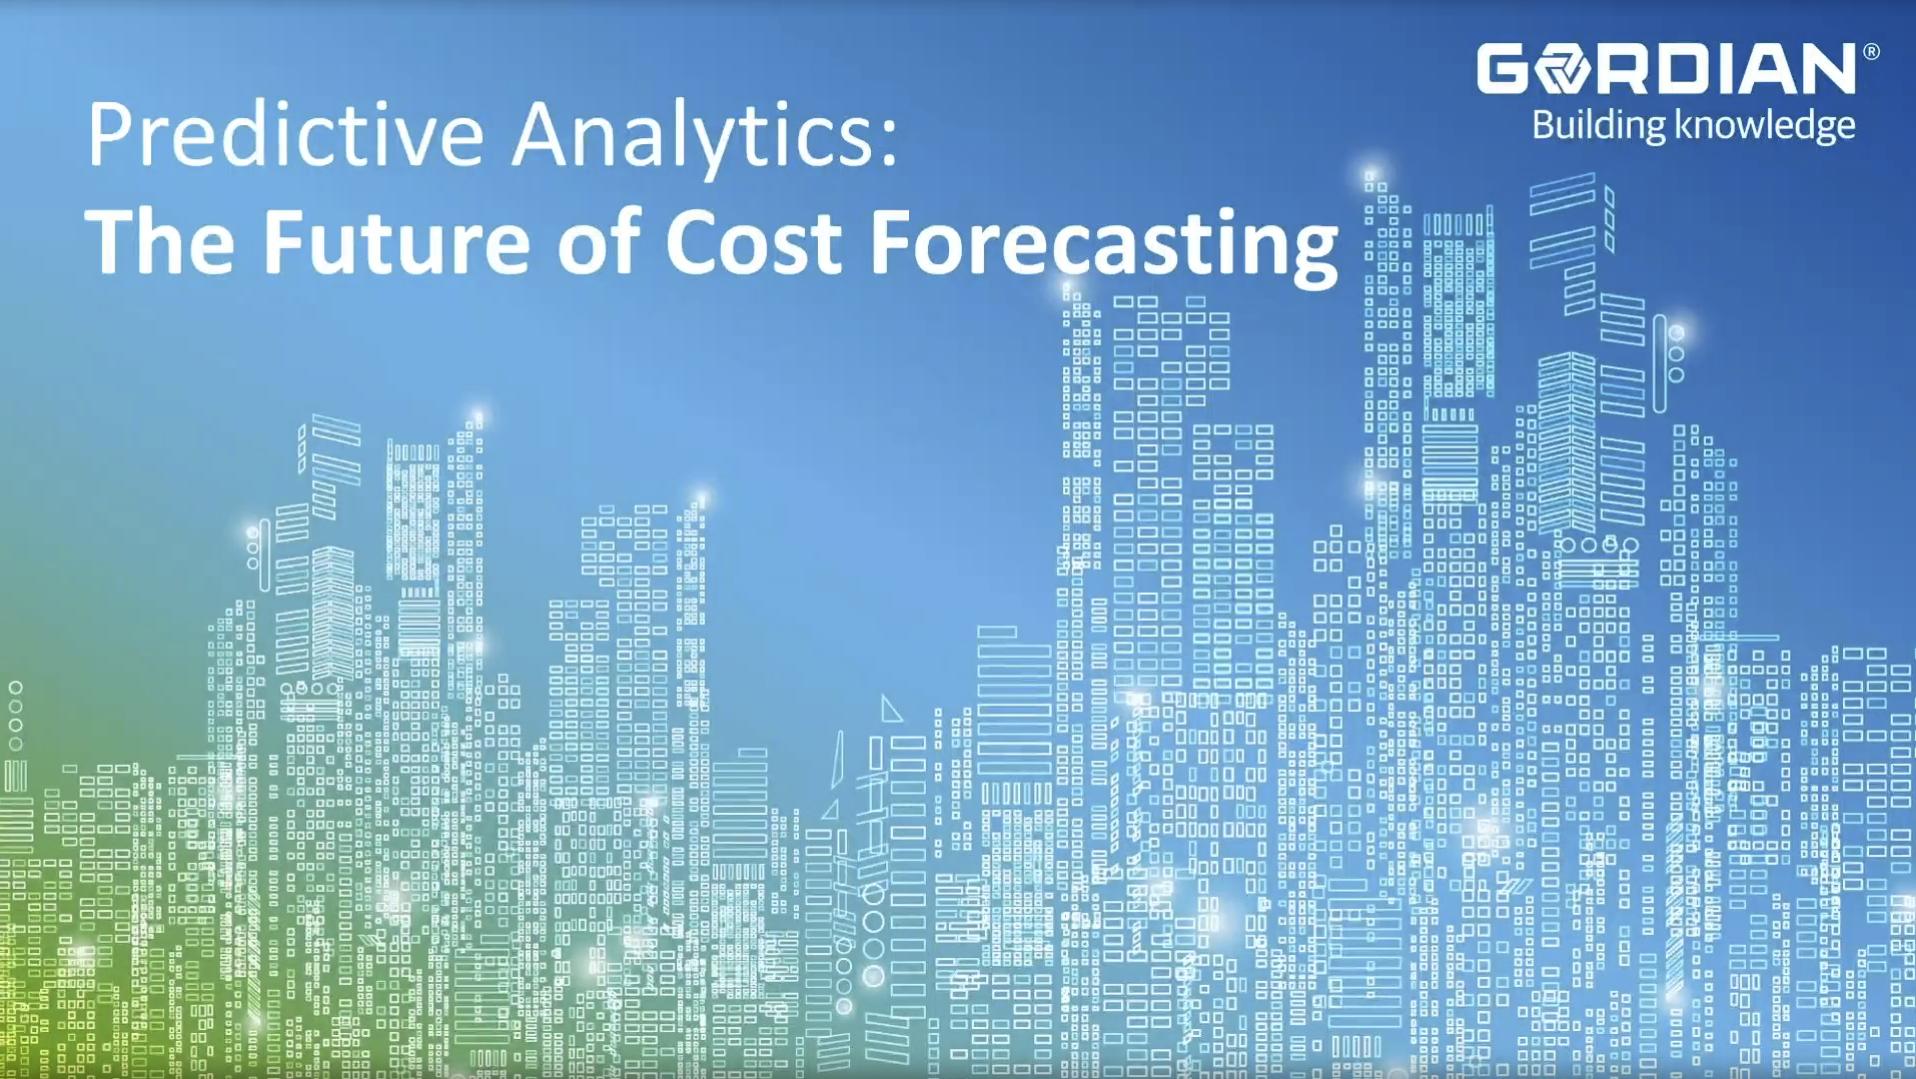 Predictive Analytics: The Future of Cost Forecasting